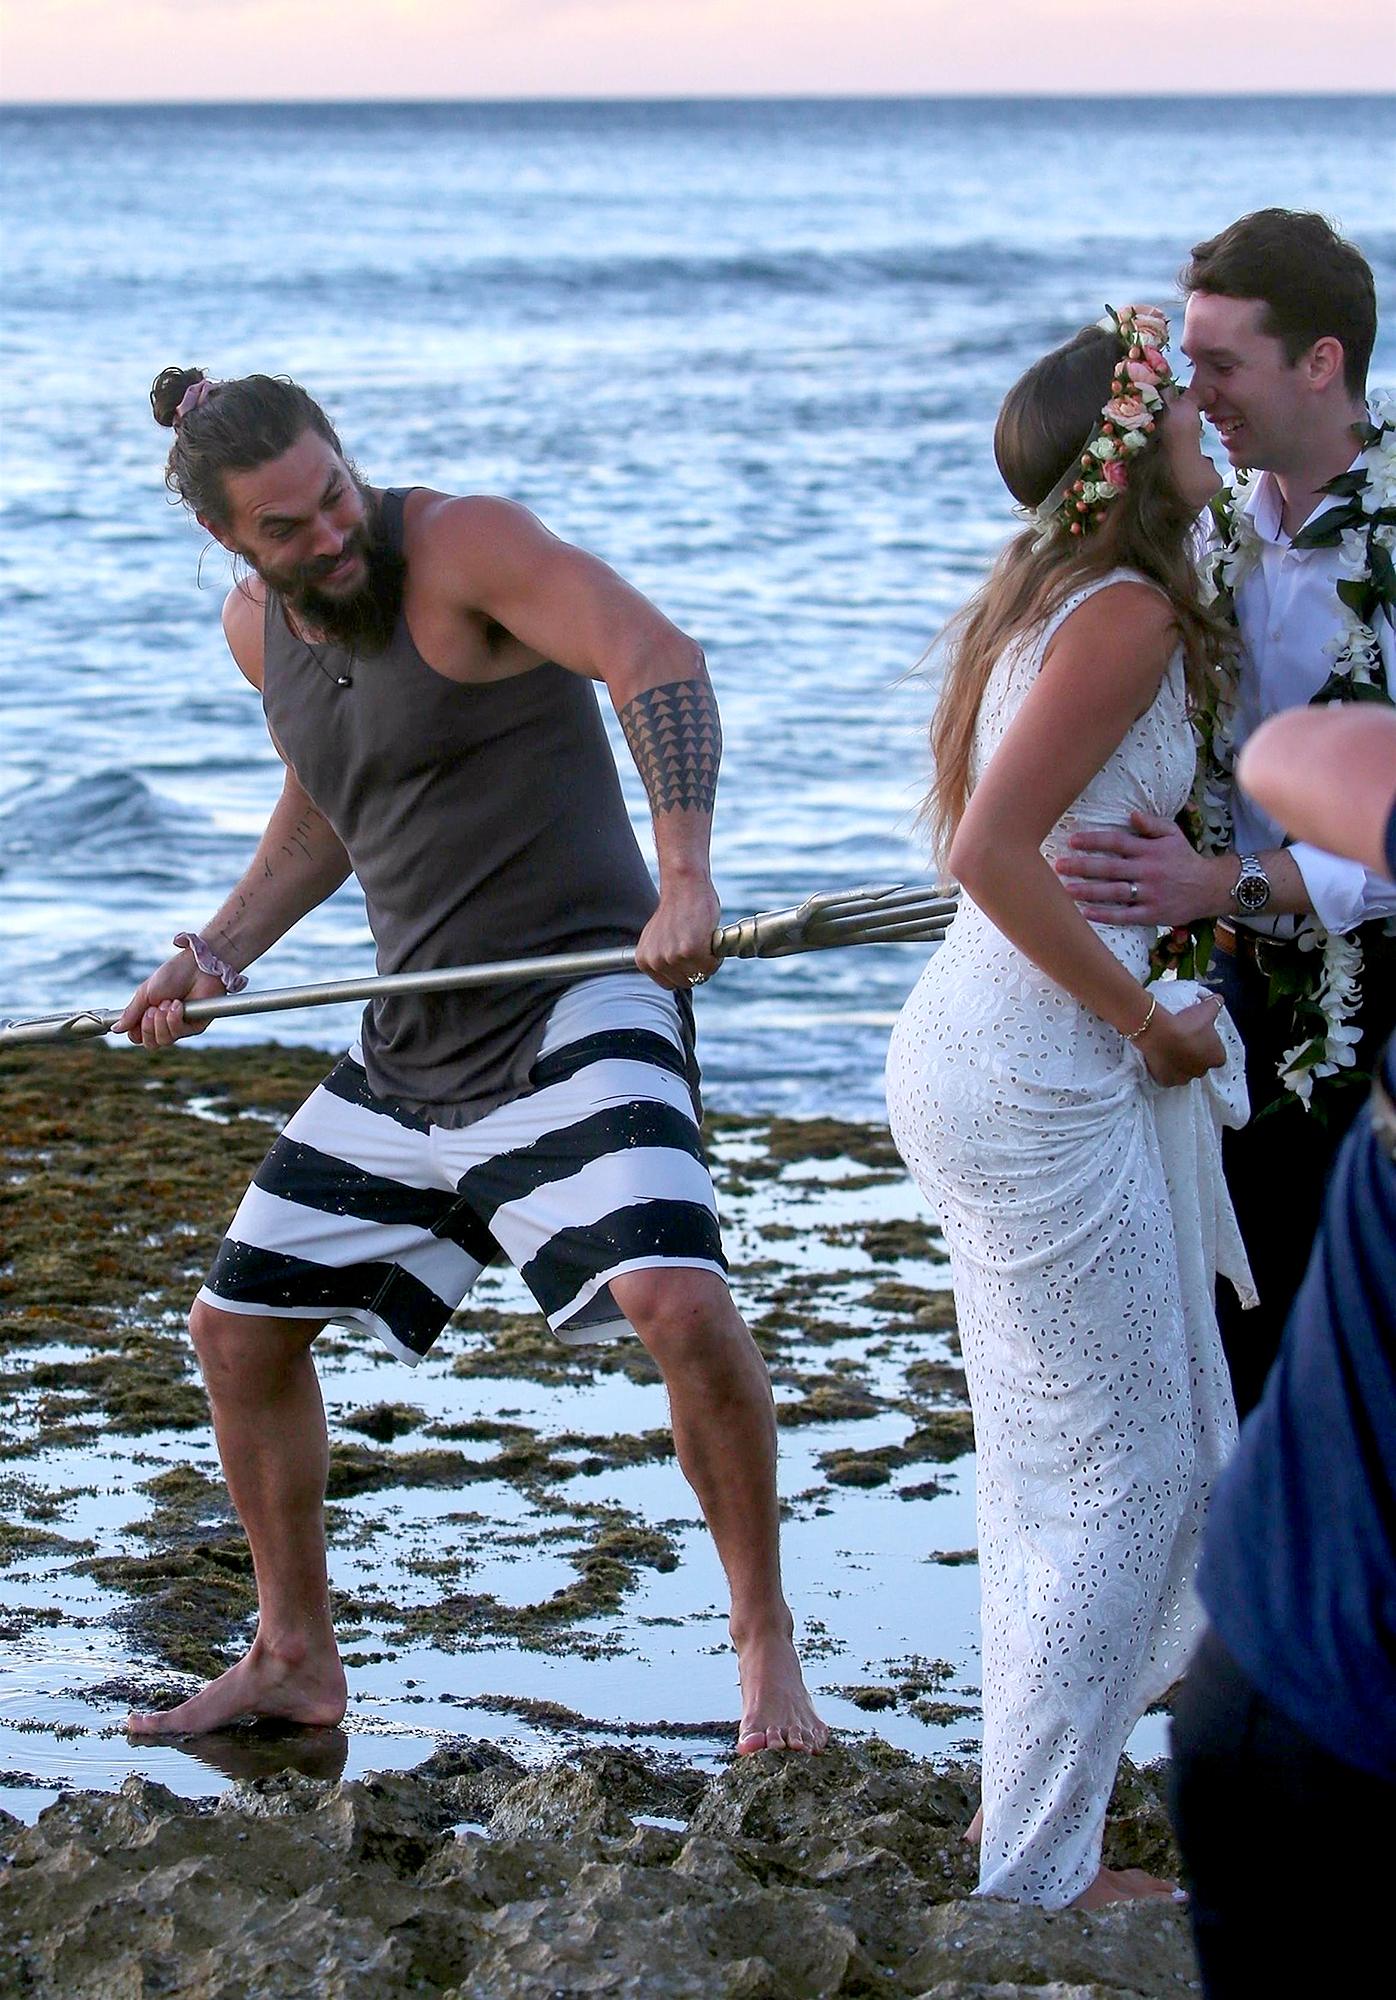 Aquaman Superstar Jason Momoa Crashed a wedding With His Trident